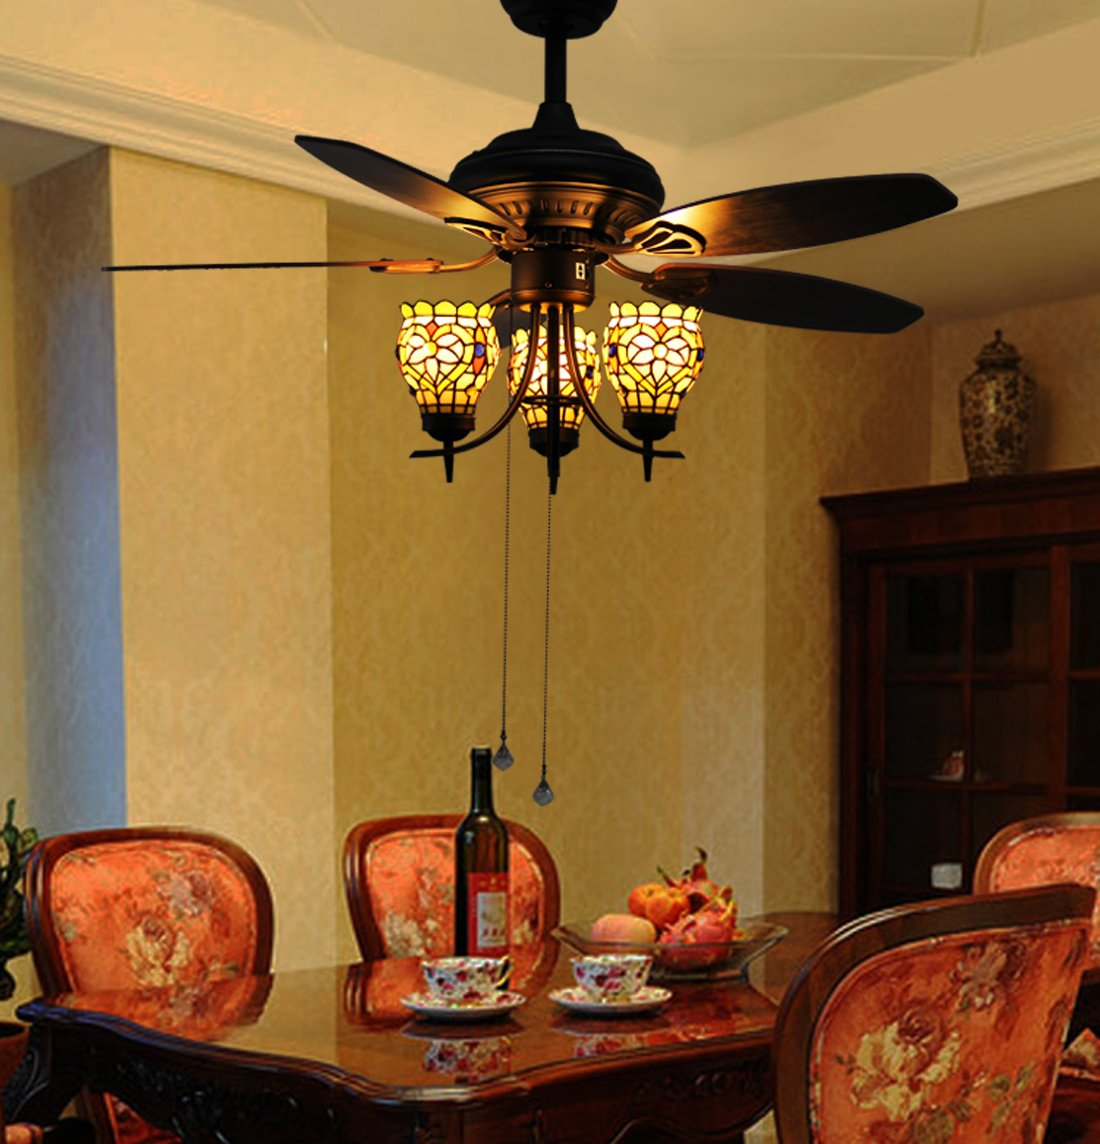 Makenier Vintage Tiffany Style Stained Glass 3-light Flowers Uplight 5-blade Ceiling Fan Light Kit 1